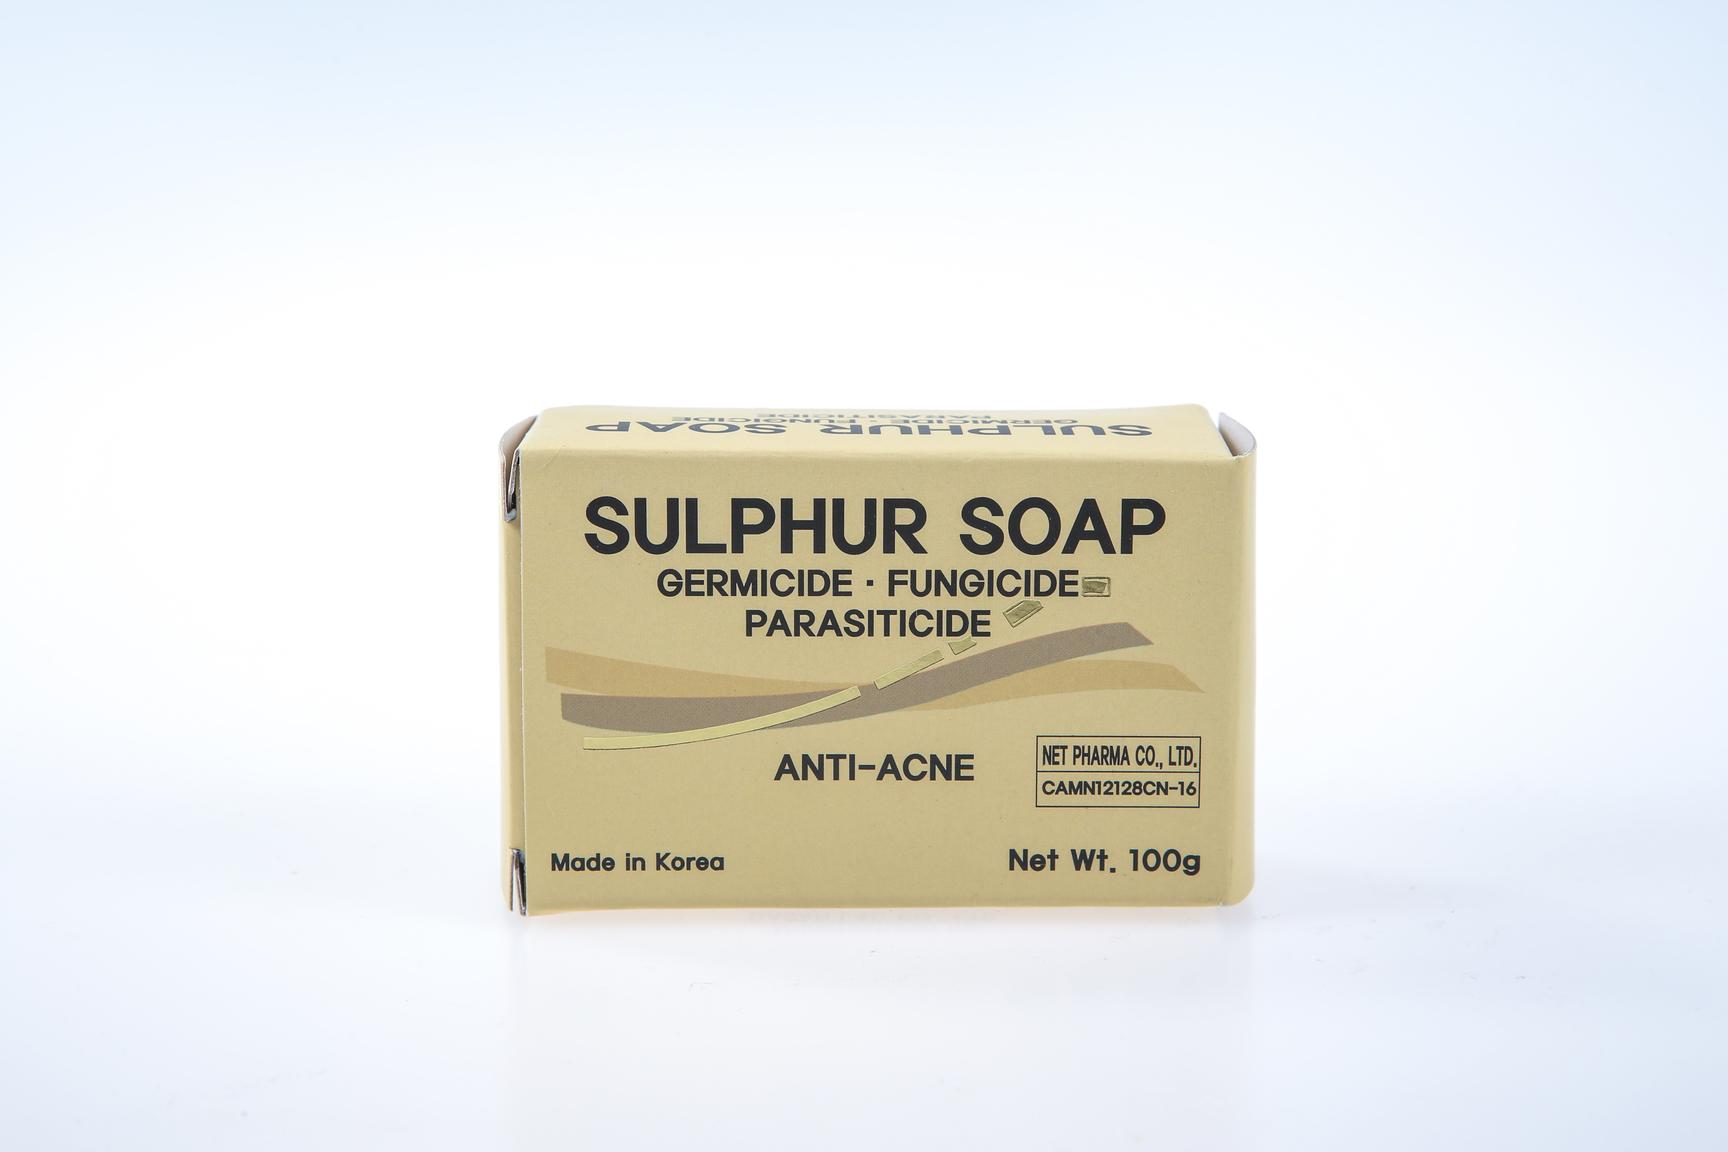 DASAN) Sulphur Soap - DASAN L&C CO, LDT  - ecplaza net